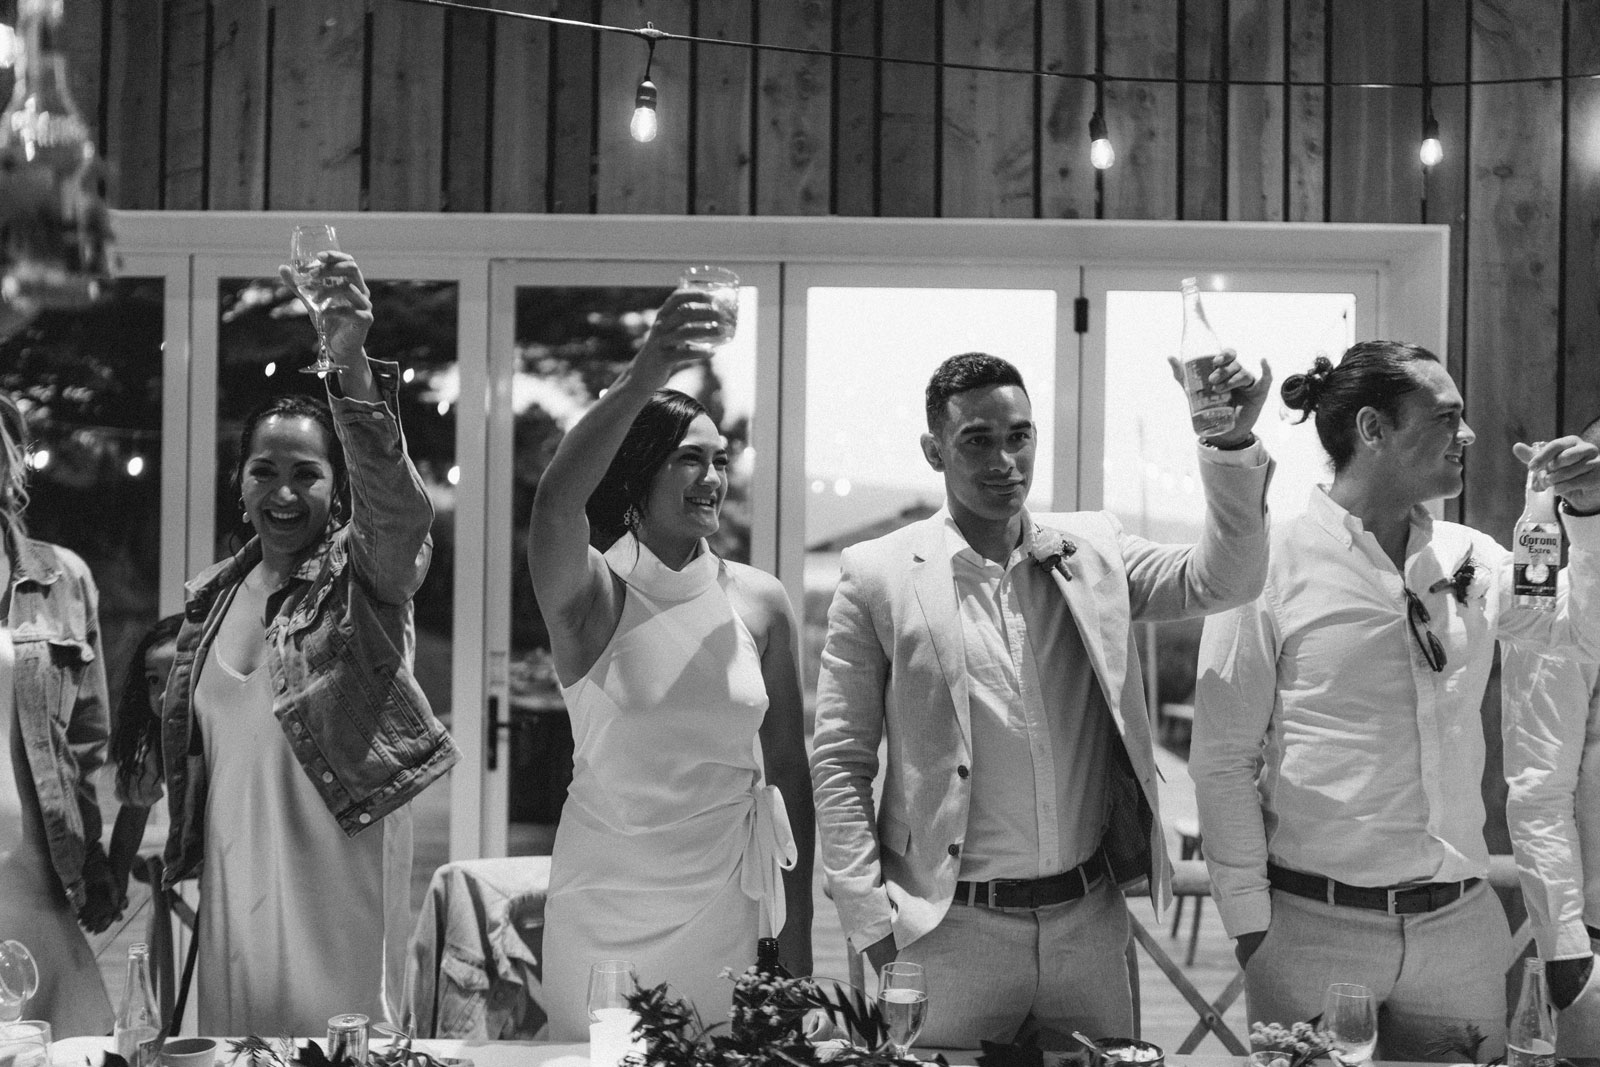 newfound-n-w-black-barn-tarawera-rotorua-wedding-photographer-965